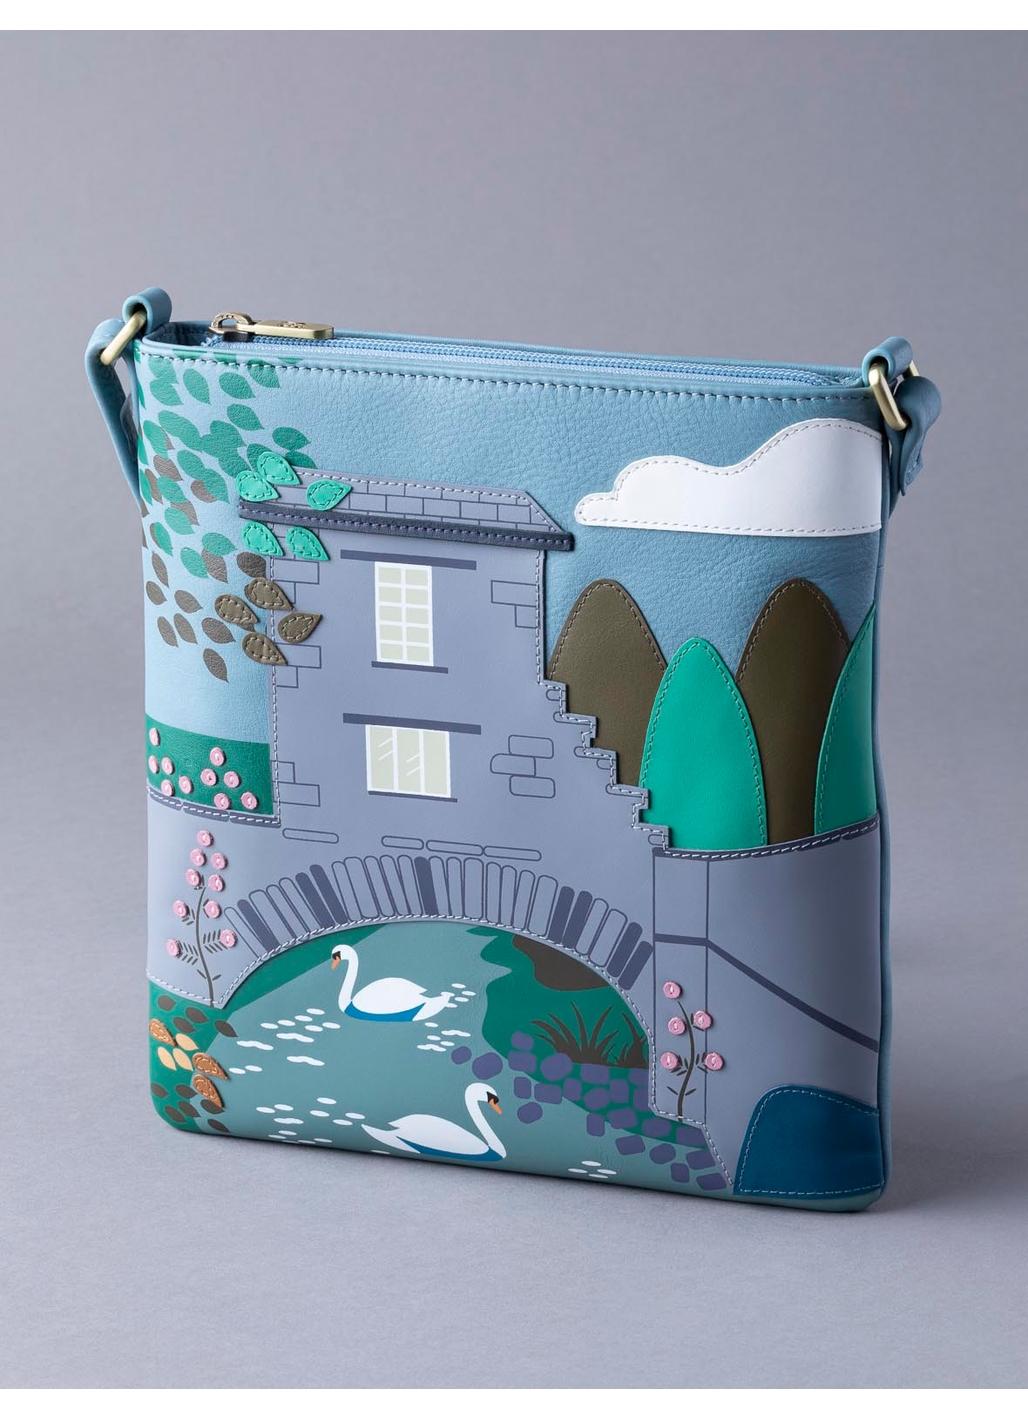 The Lakes Bridge House Cross Body Bag